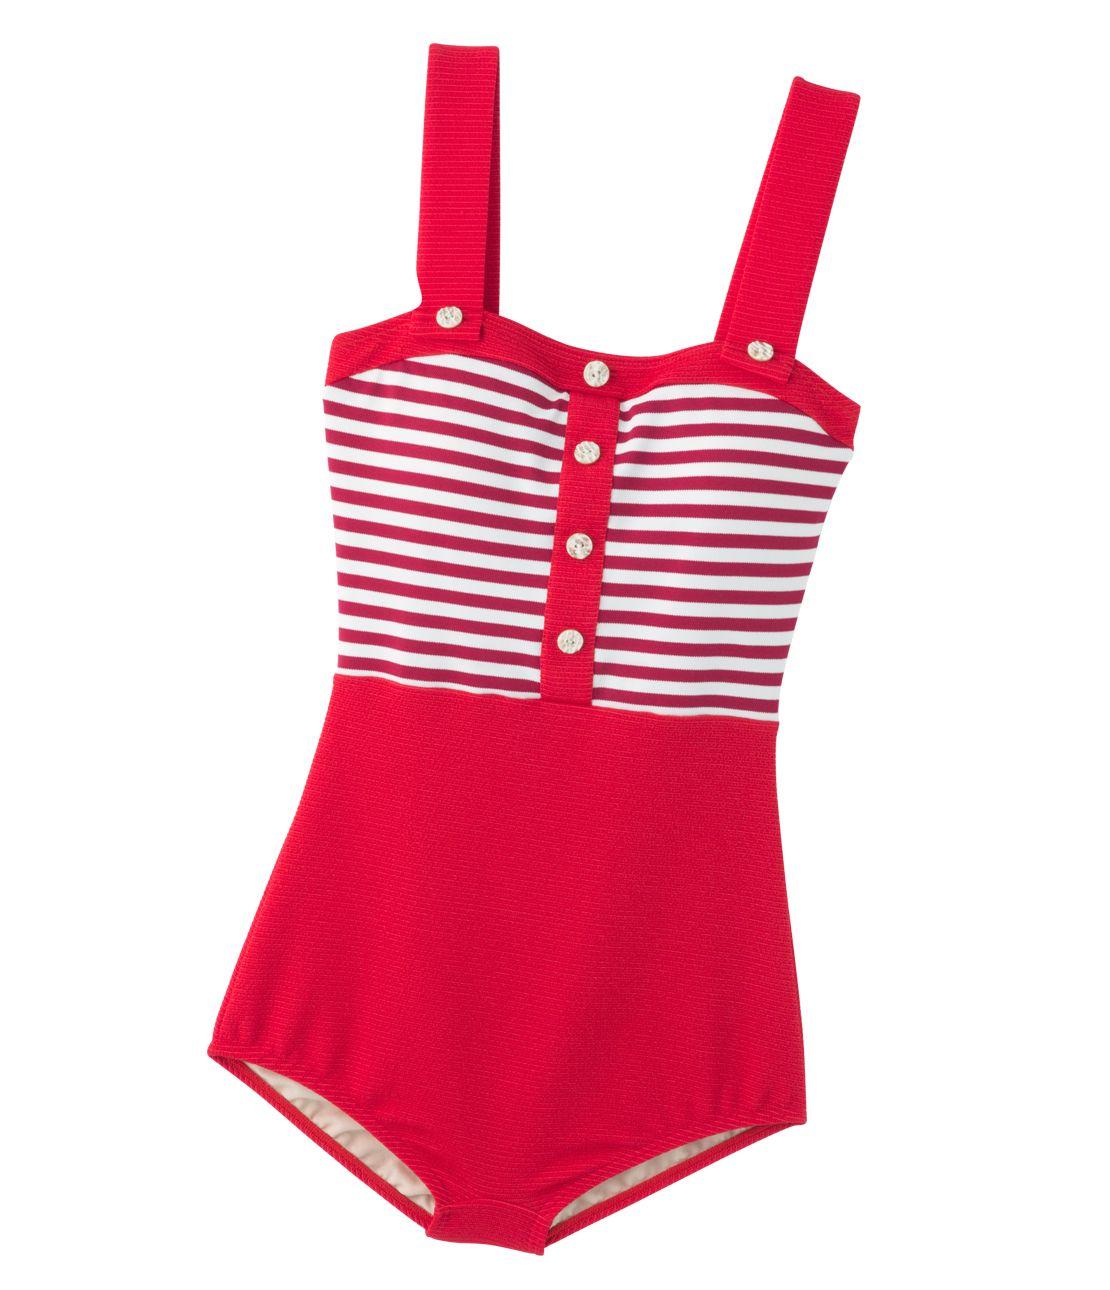 YM retro style swimsuit